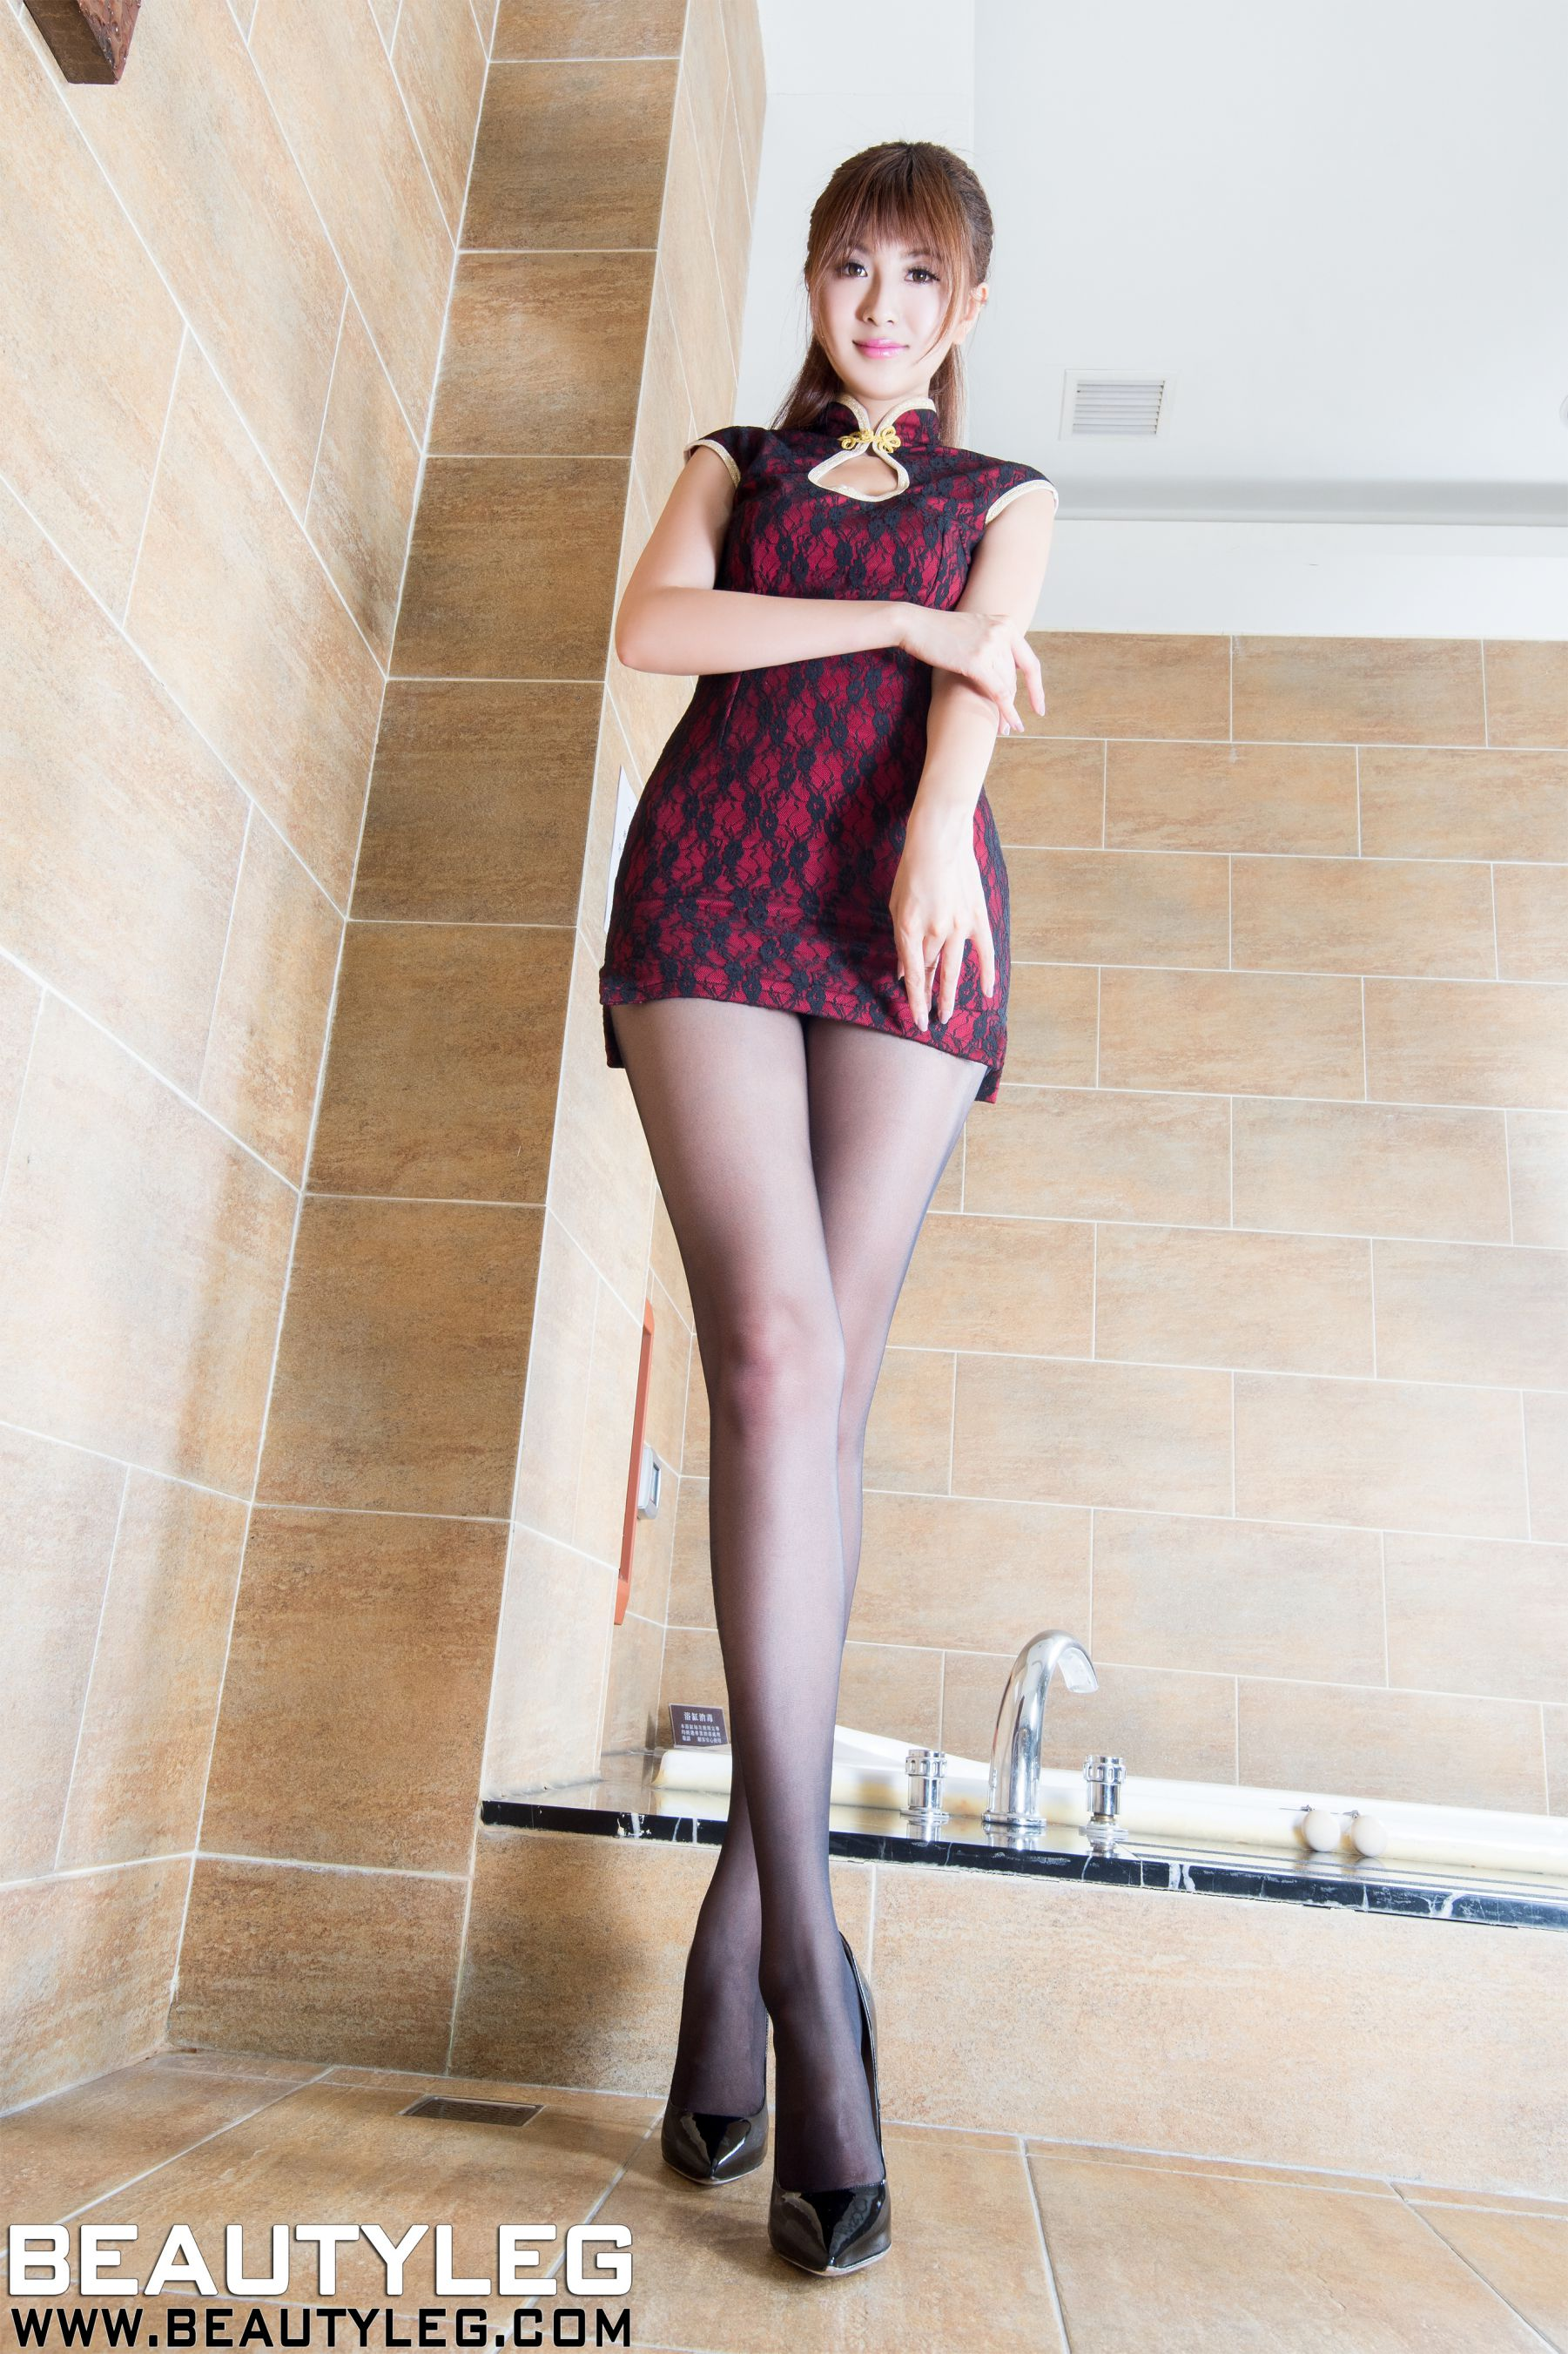 VOL.51 [Beautyleg]美腿旗袍:简晓育(腿模Vicni,晓育儿)超高清个人性感漂亮大图(50P)